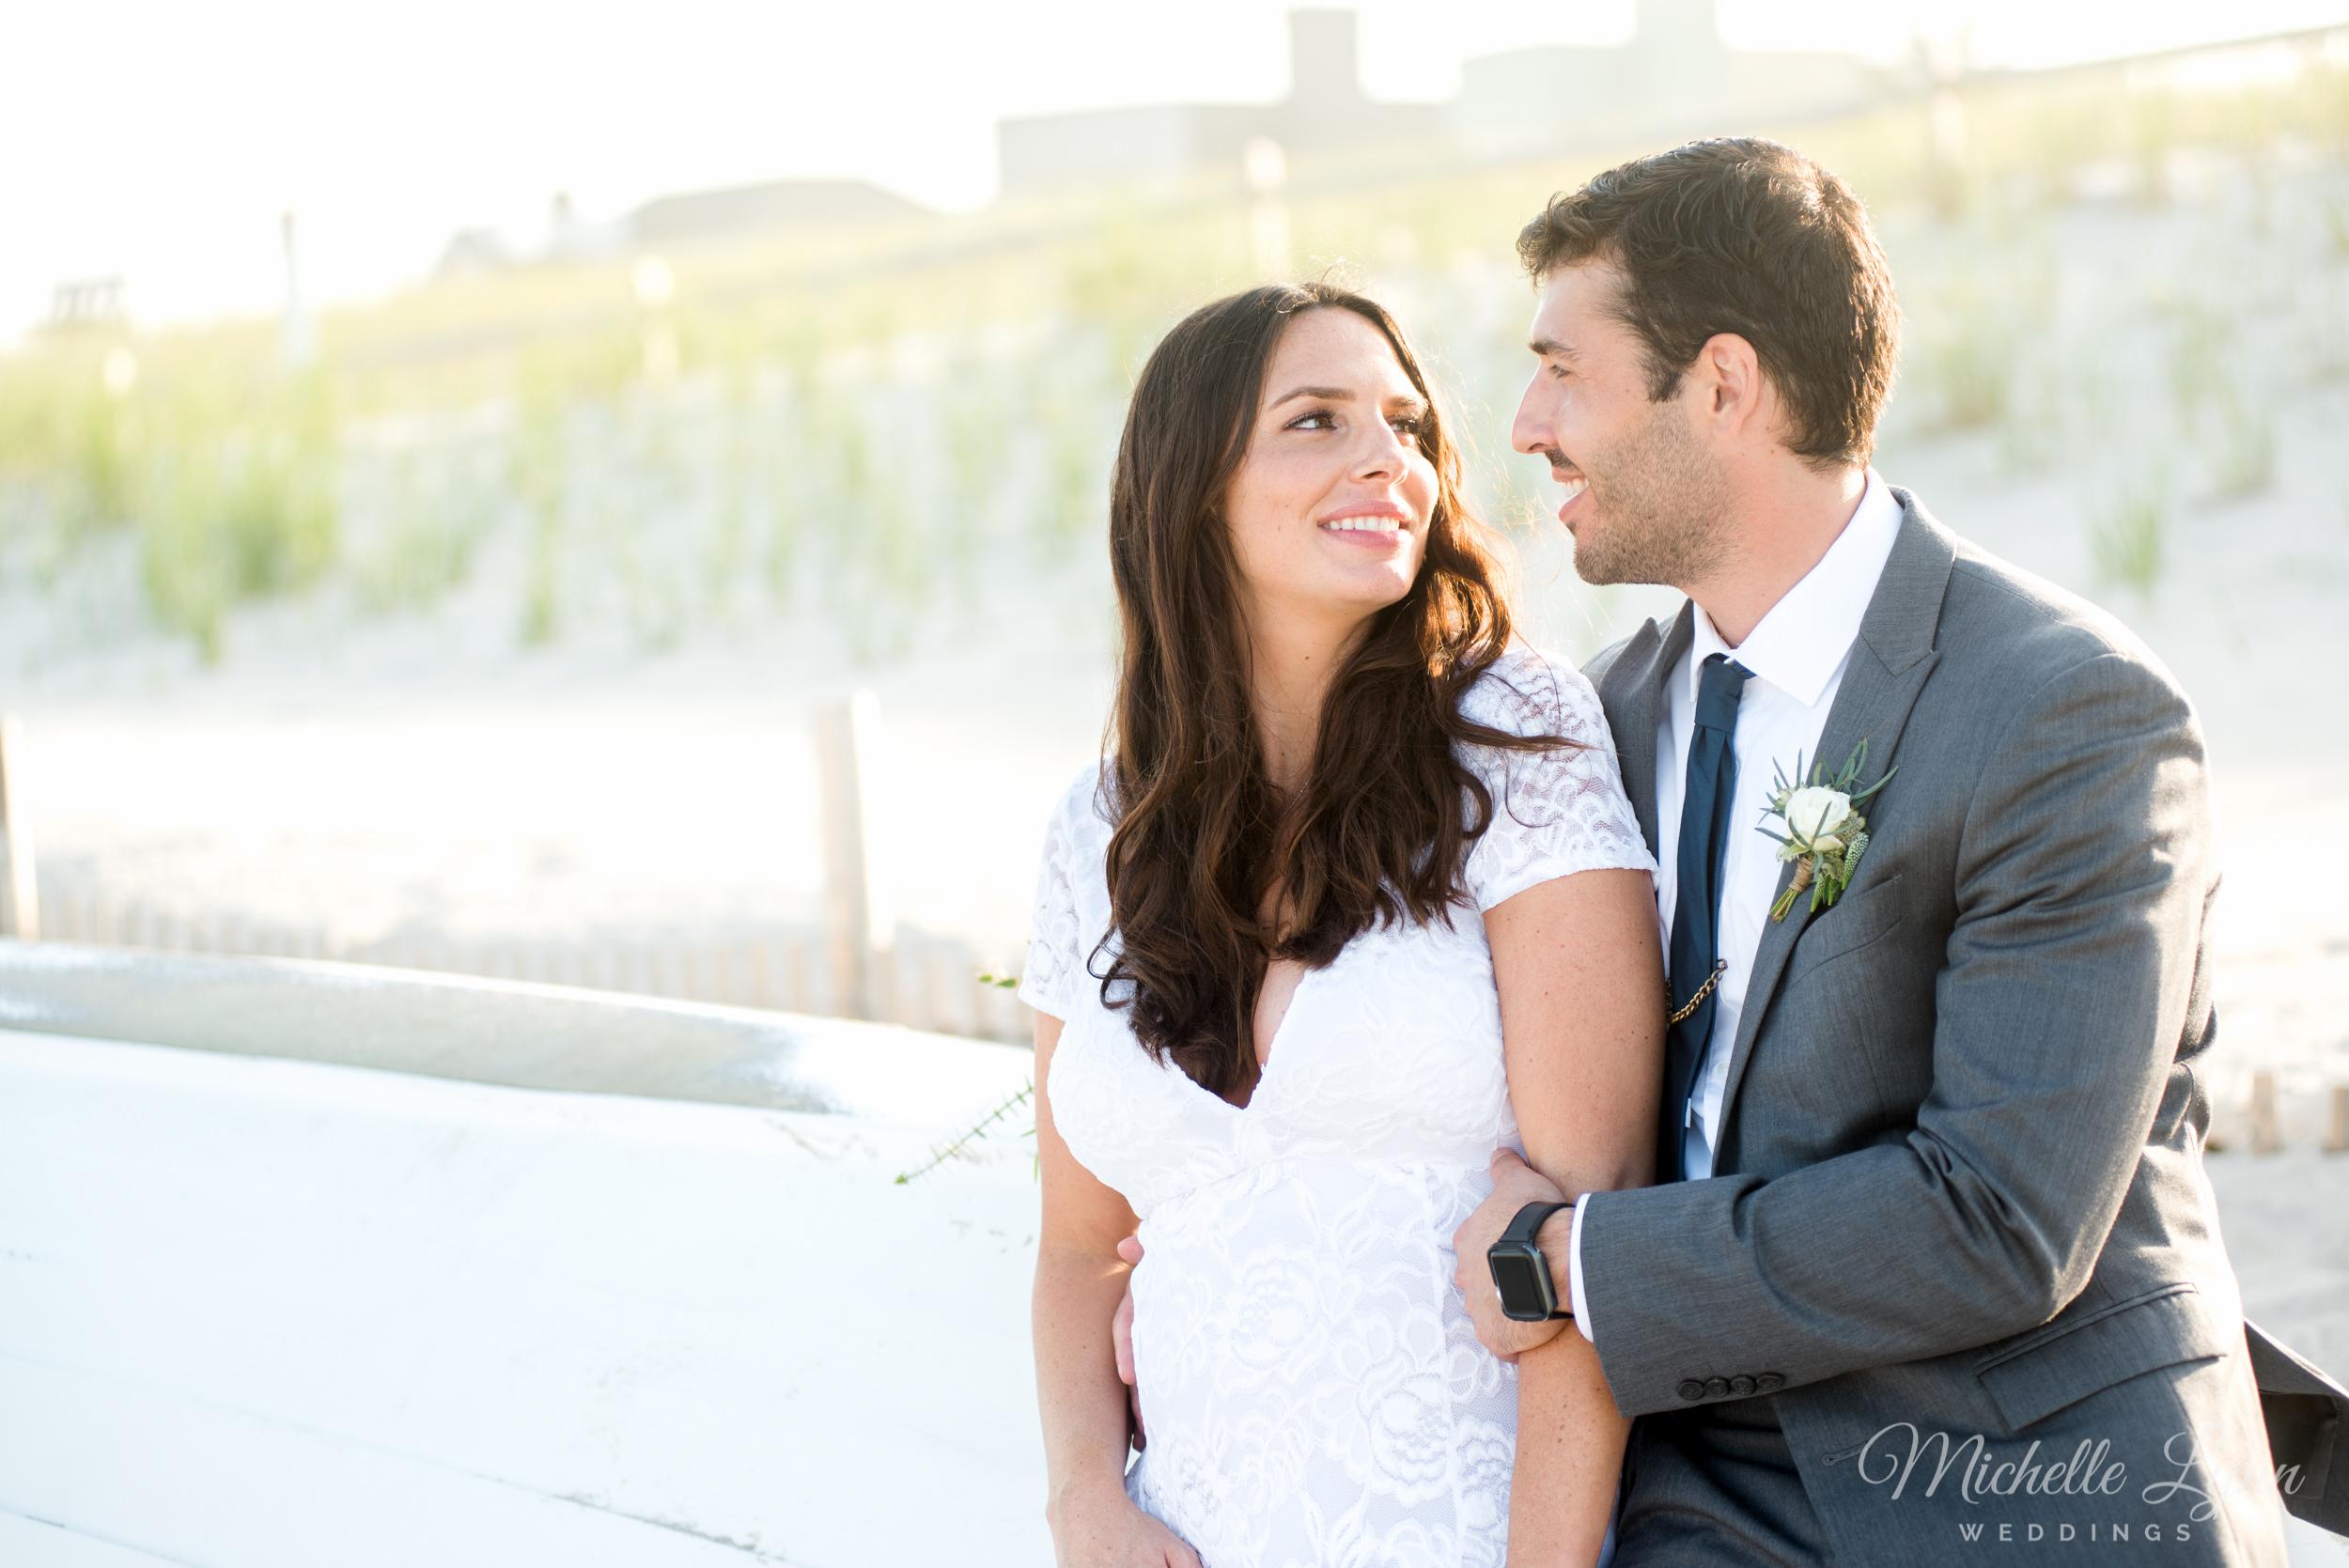 mlw-long-beach-island-new-jersey-wedding-photography-23.jpg